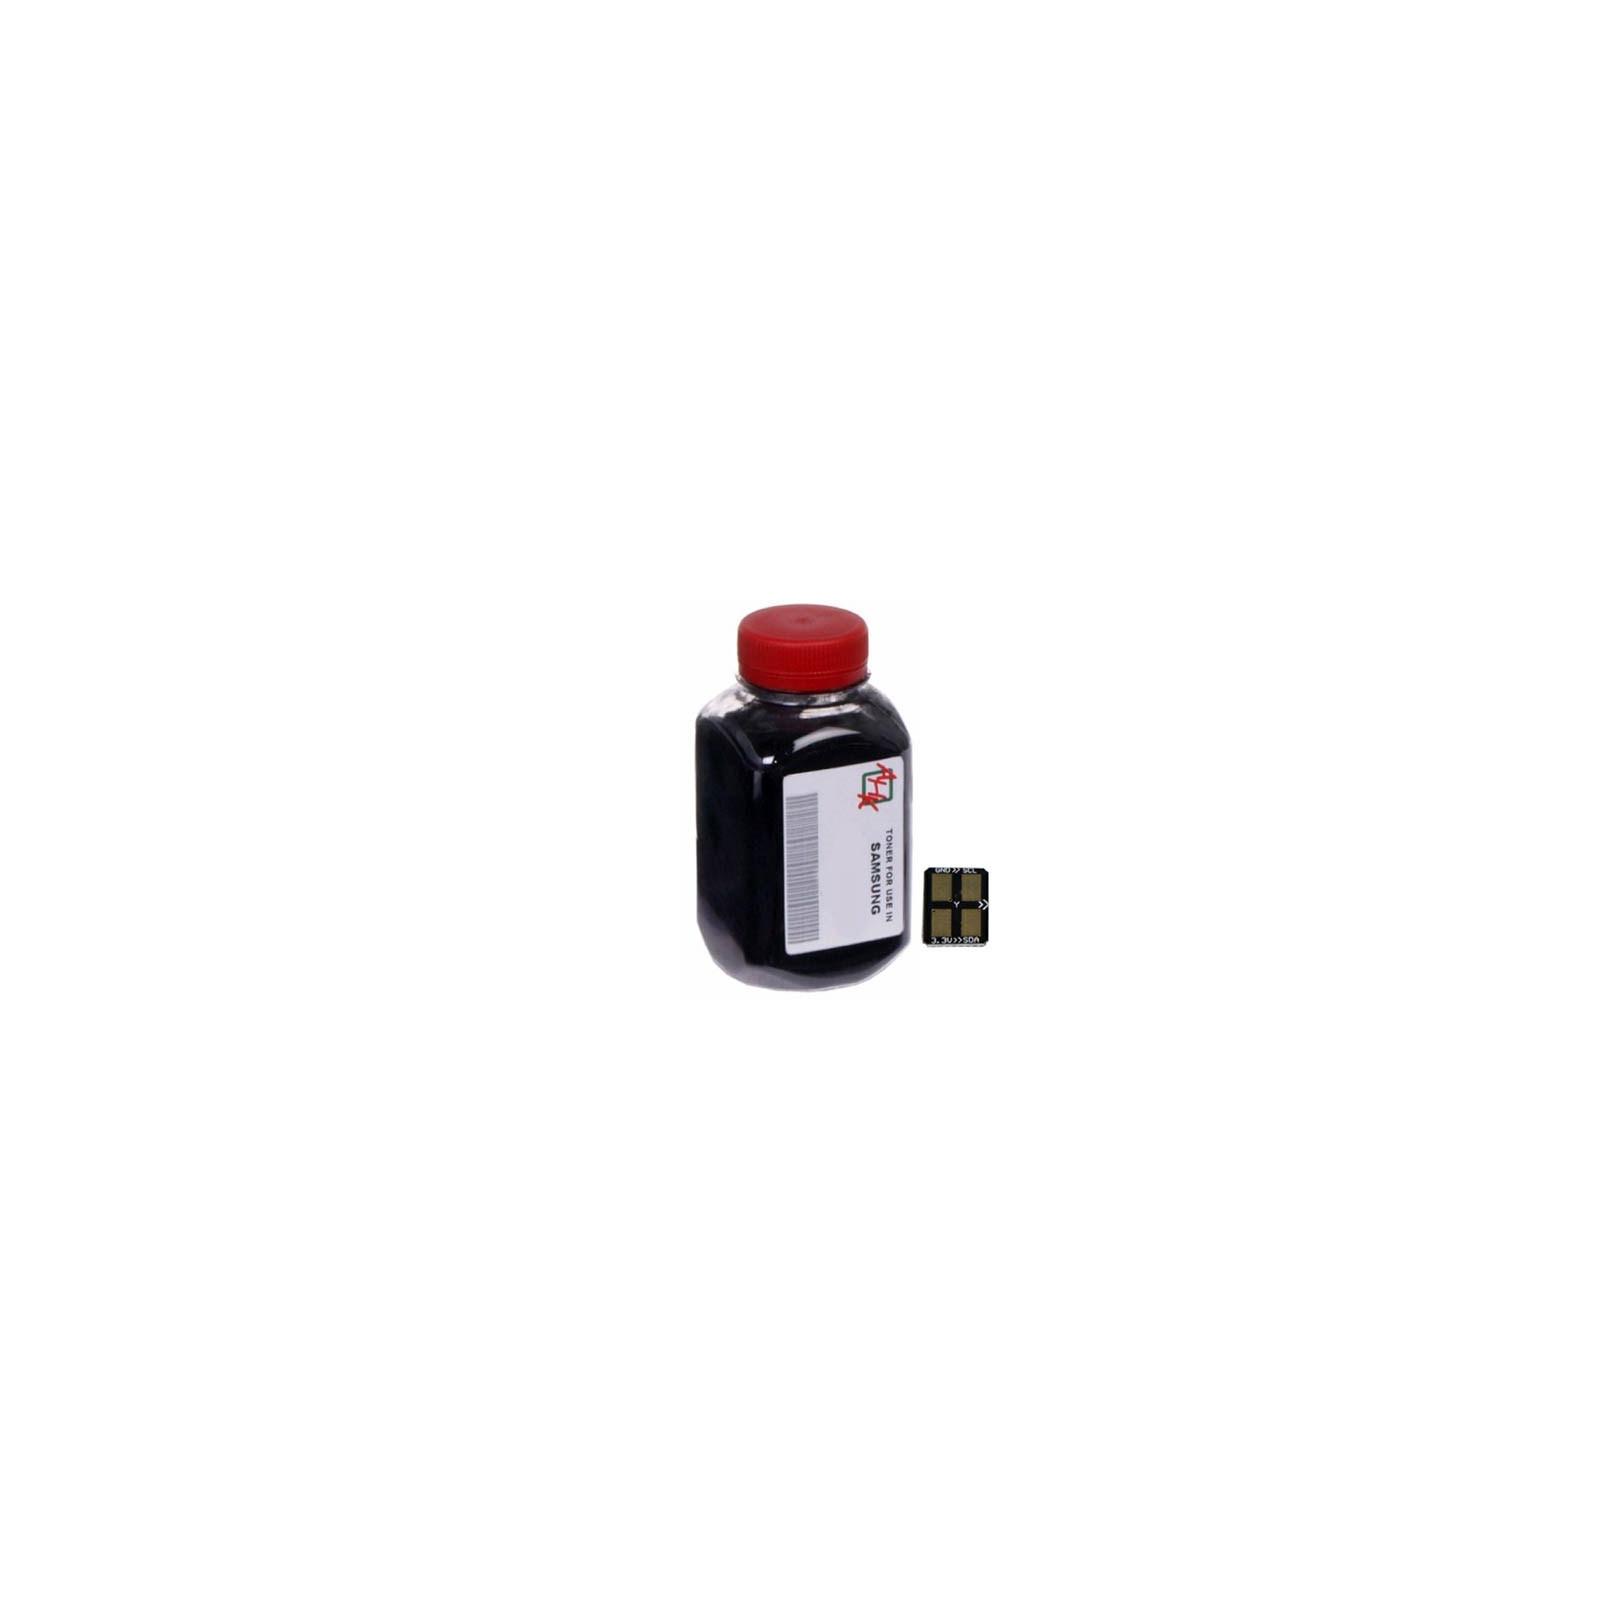 Тонер SAMSUNG CLP-320/325 Black+chip AHK (1500212)